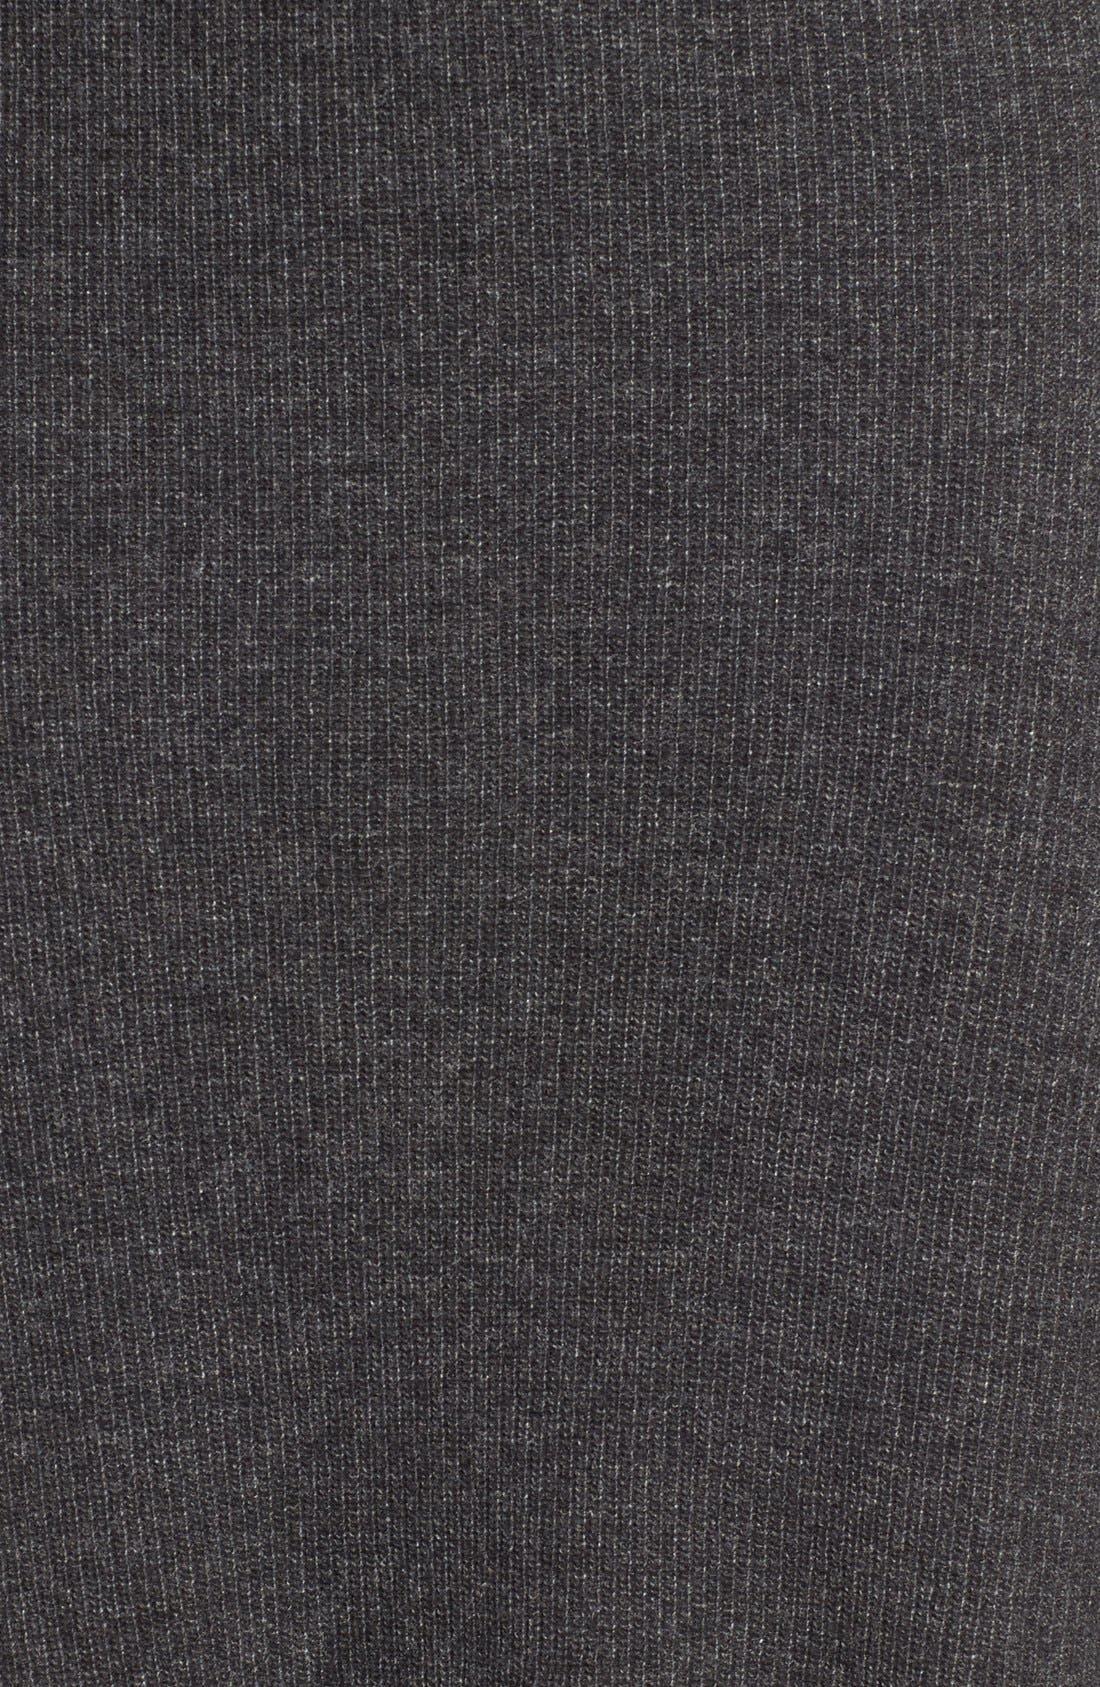 Rib Knit Sweater Skirt,                             Alternate thumbnail 4, color,                             030